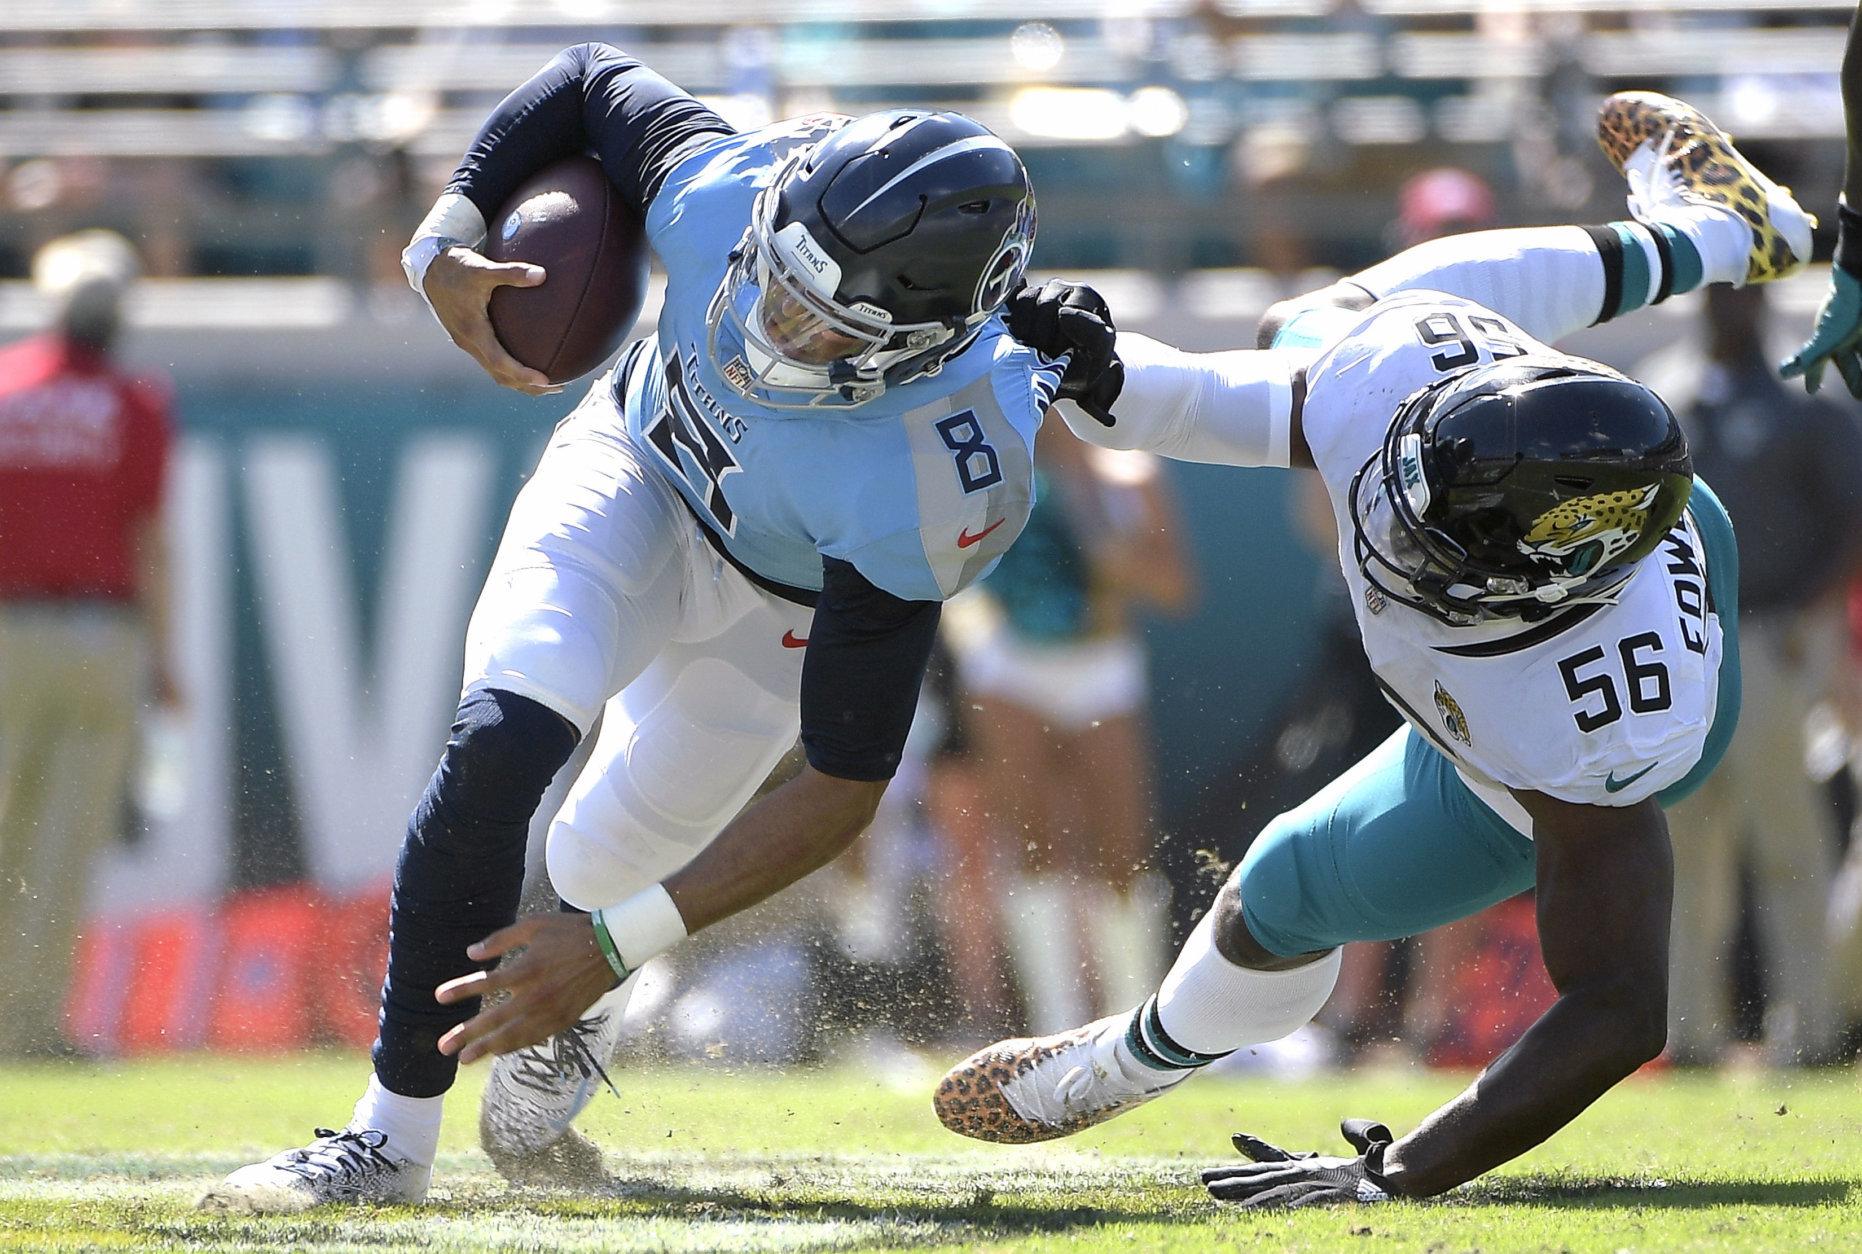 Jacksonville Jaguars defensive end Dante Fowler (56) tackles Tennessee Titans quarterback Marcus Mariota (8) during the second half of an NFL football game, Sunday, Sept. 23, 2018, in Jacksonville, Fla. (AP Photo/Phelan M. Ebenhack)